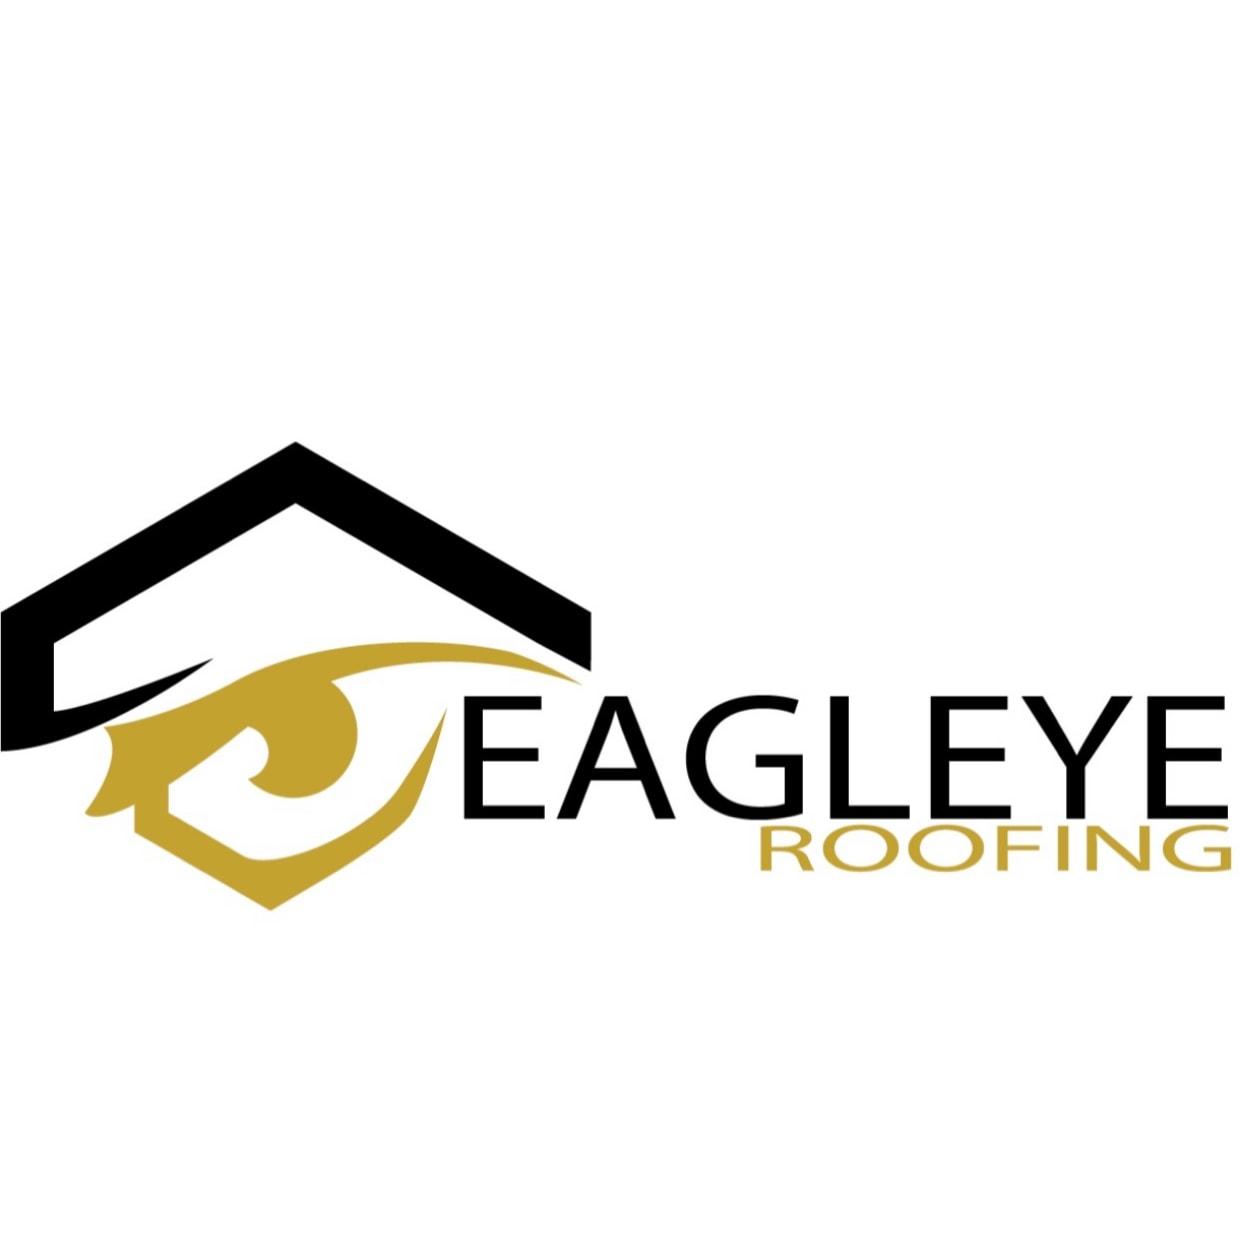 Eagleye Roofing logo